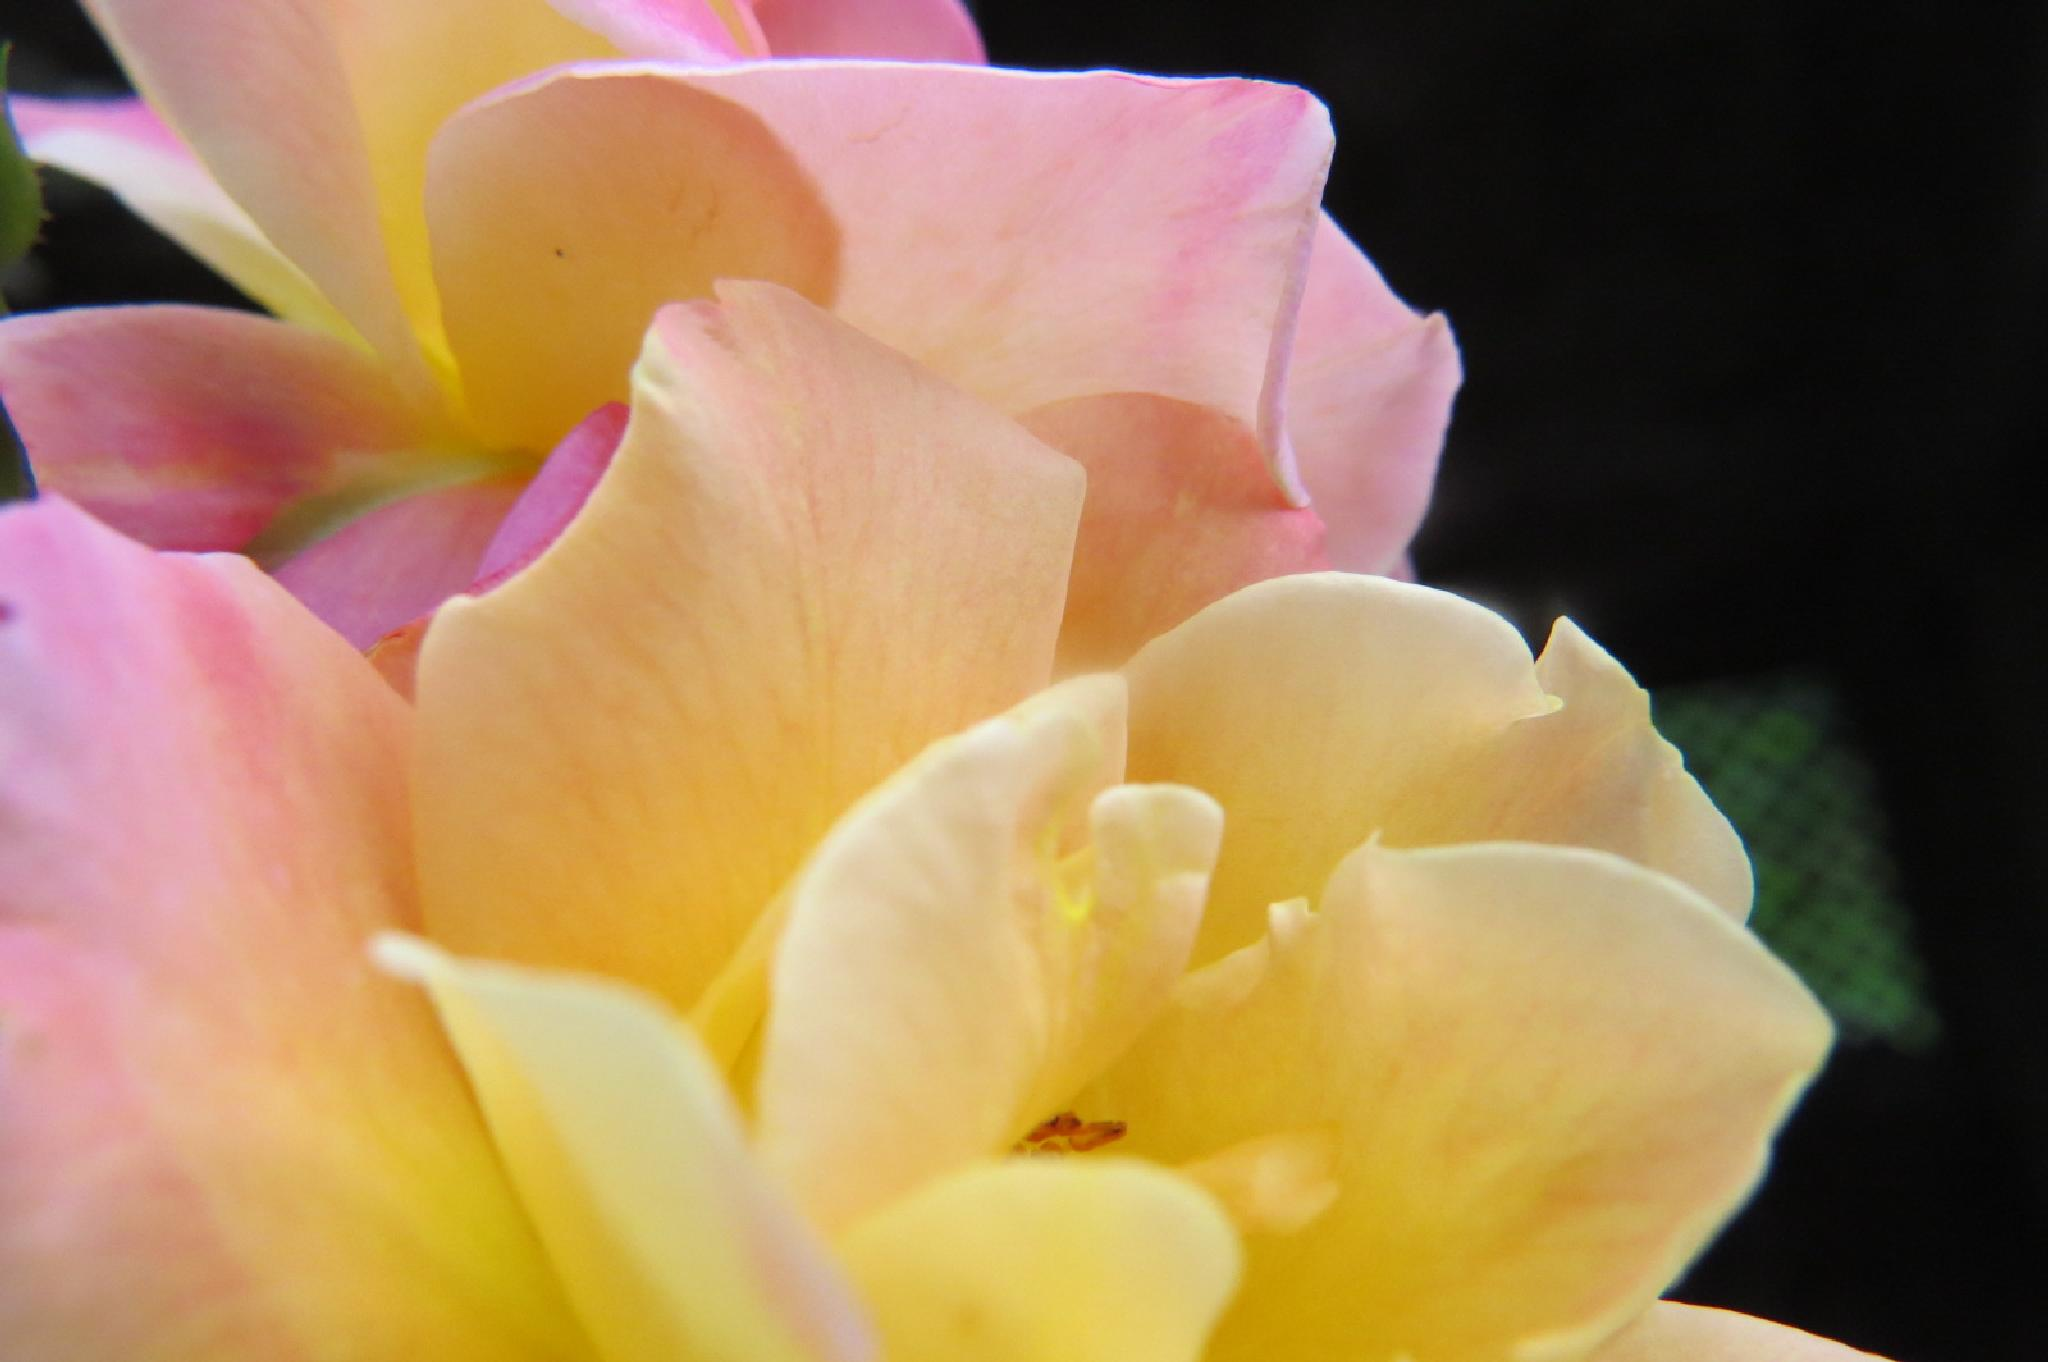 Rose petals  by Mary E Munisteri